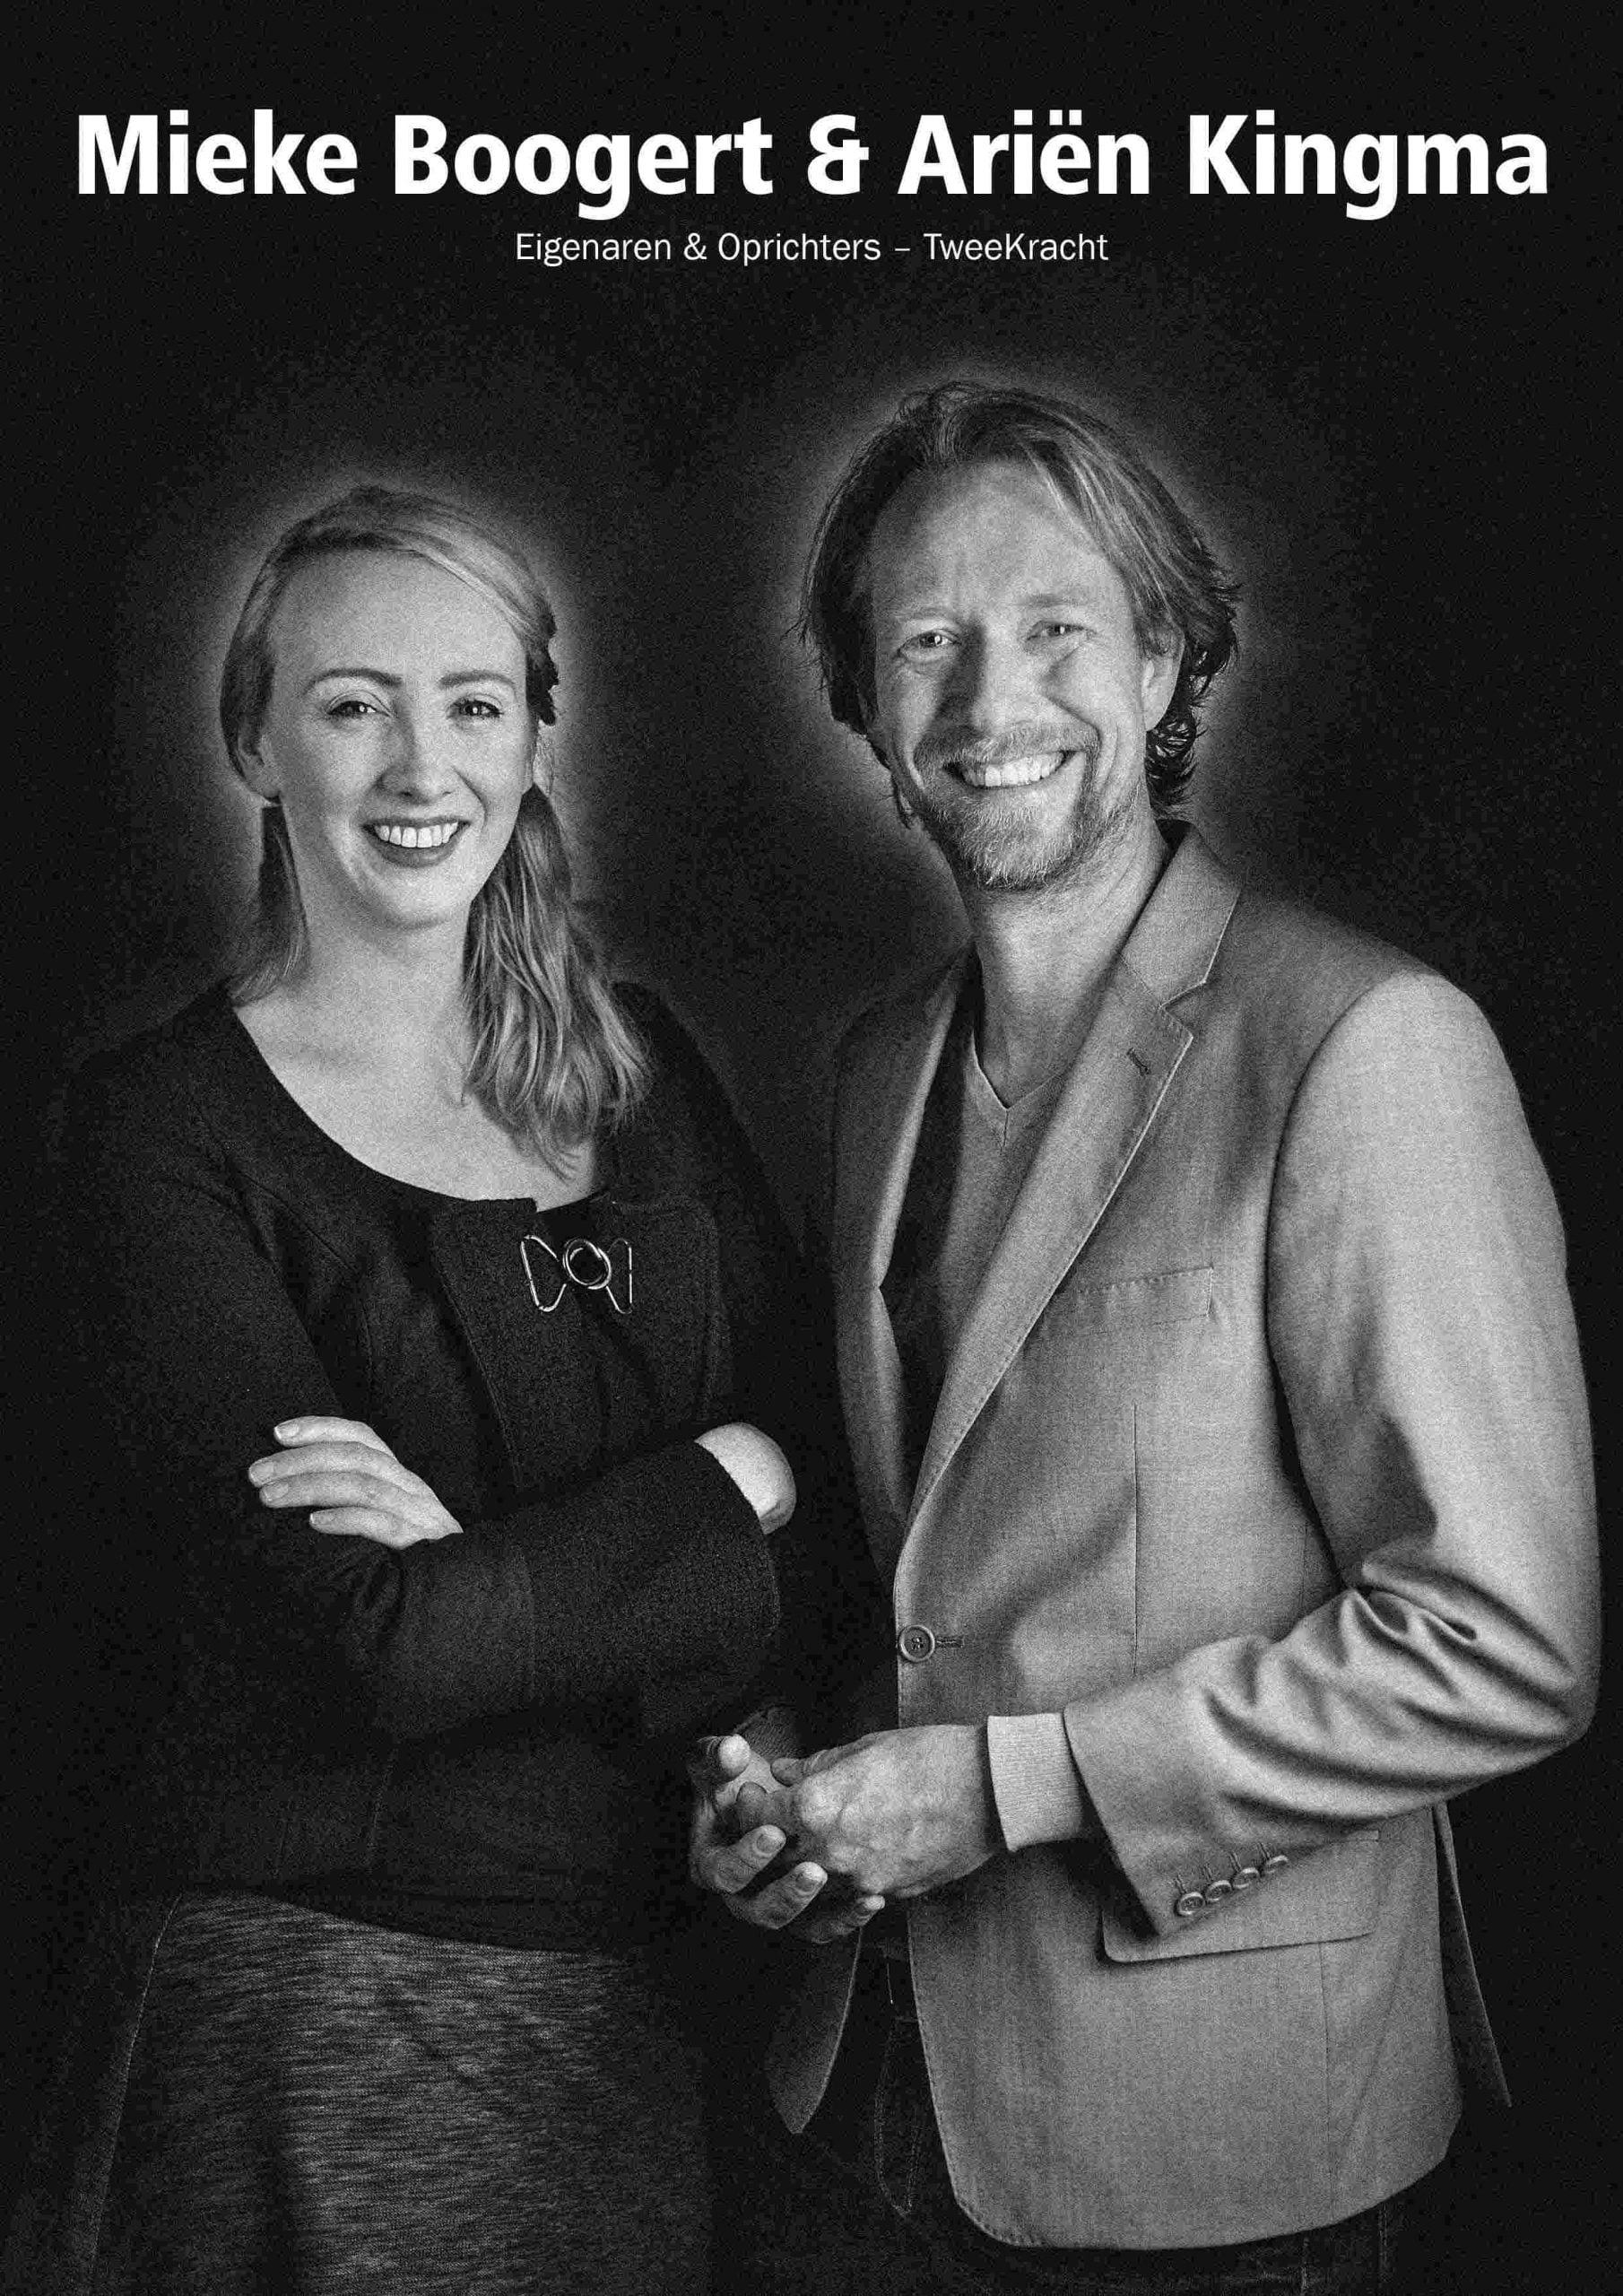 Mieke Boogerten Arien Kingma webinarinspiredbycor.nl